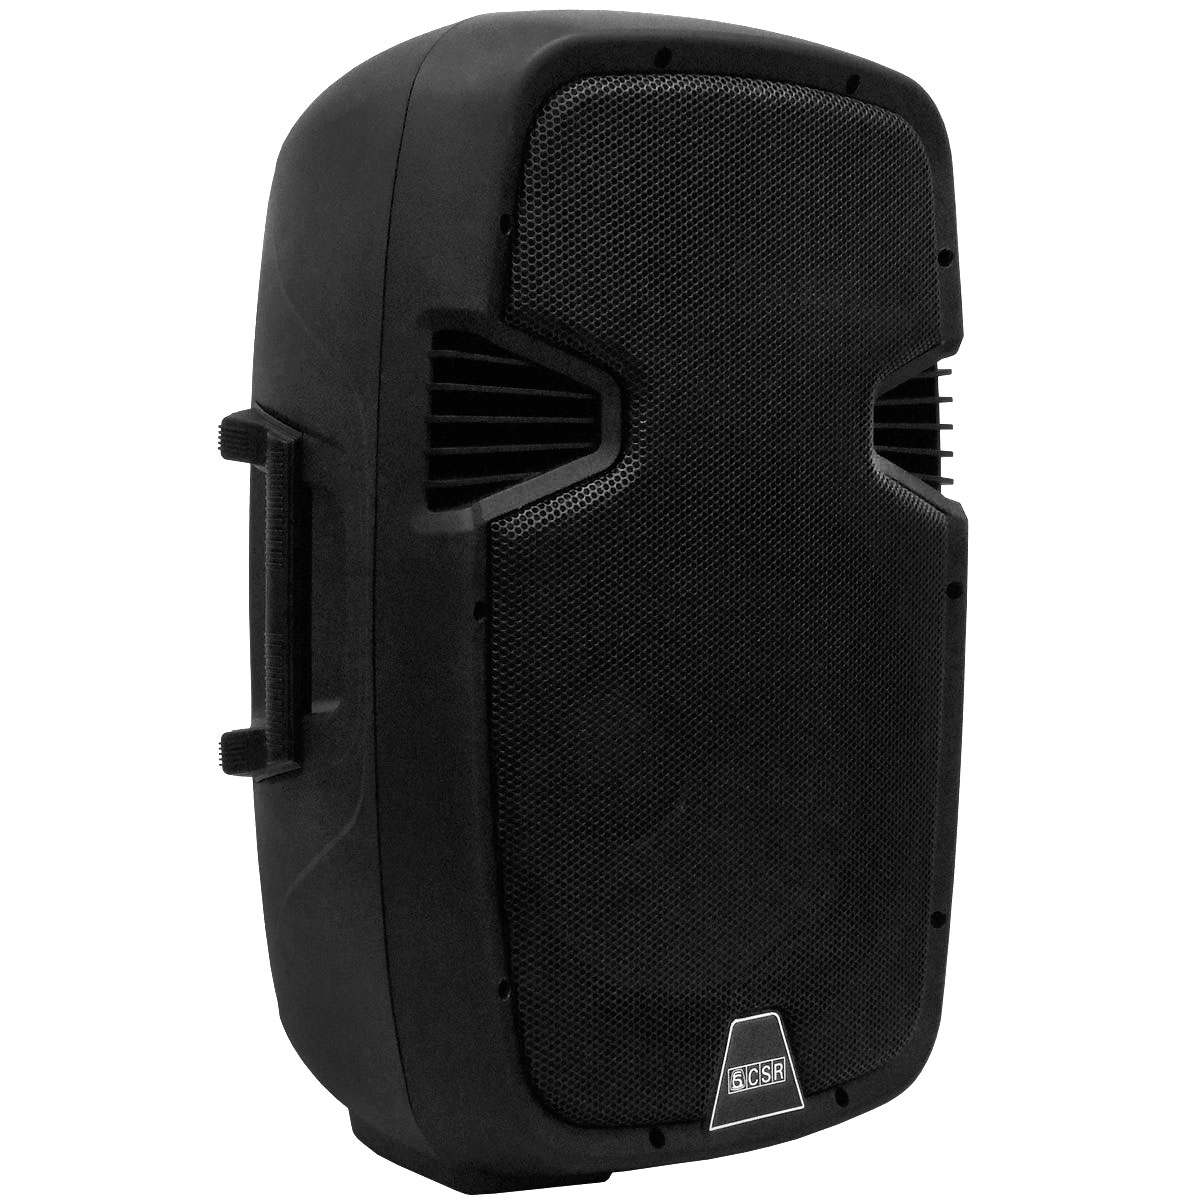 Caixa Ativa Fal 10 Pol 100W c/ USB / Bluetooth - CSR 5510 USB BT